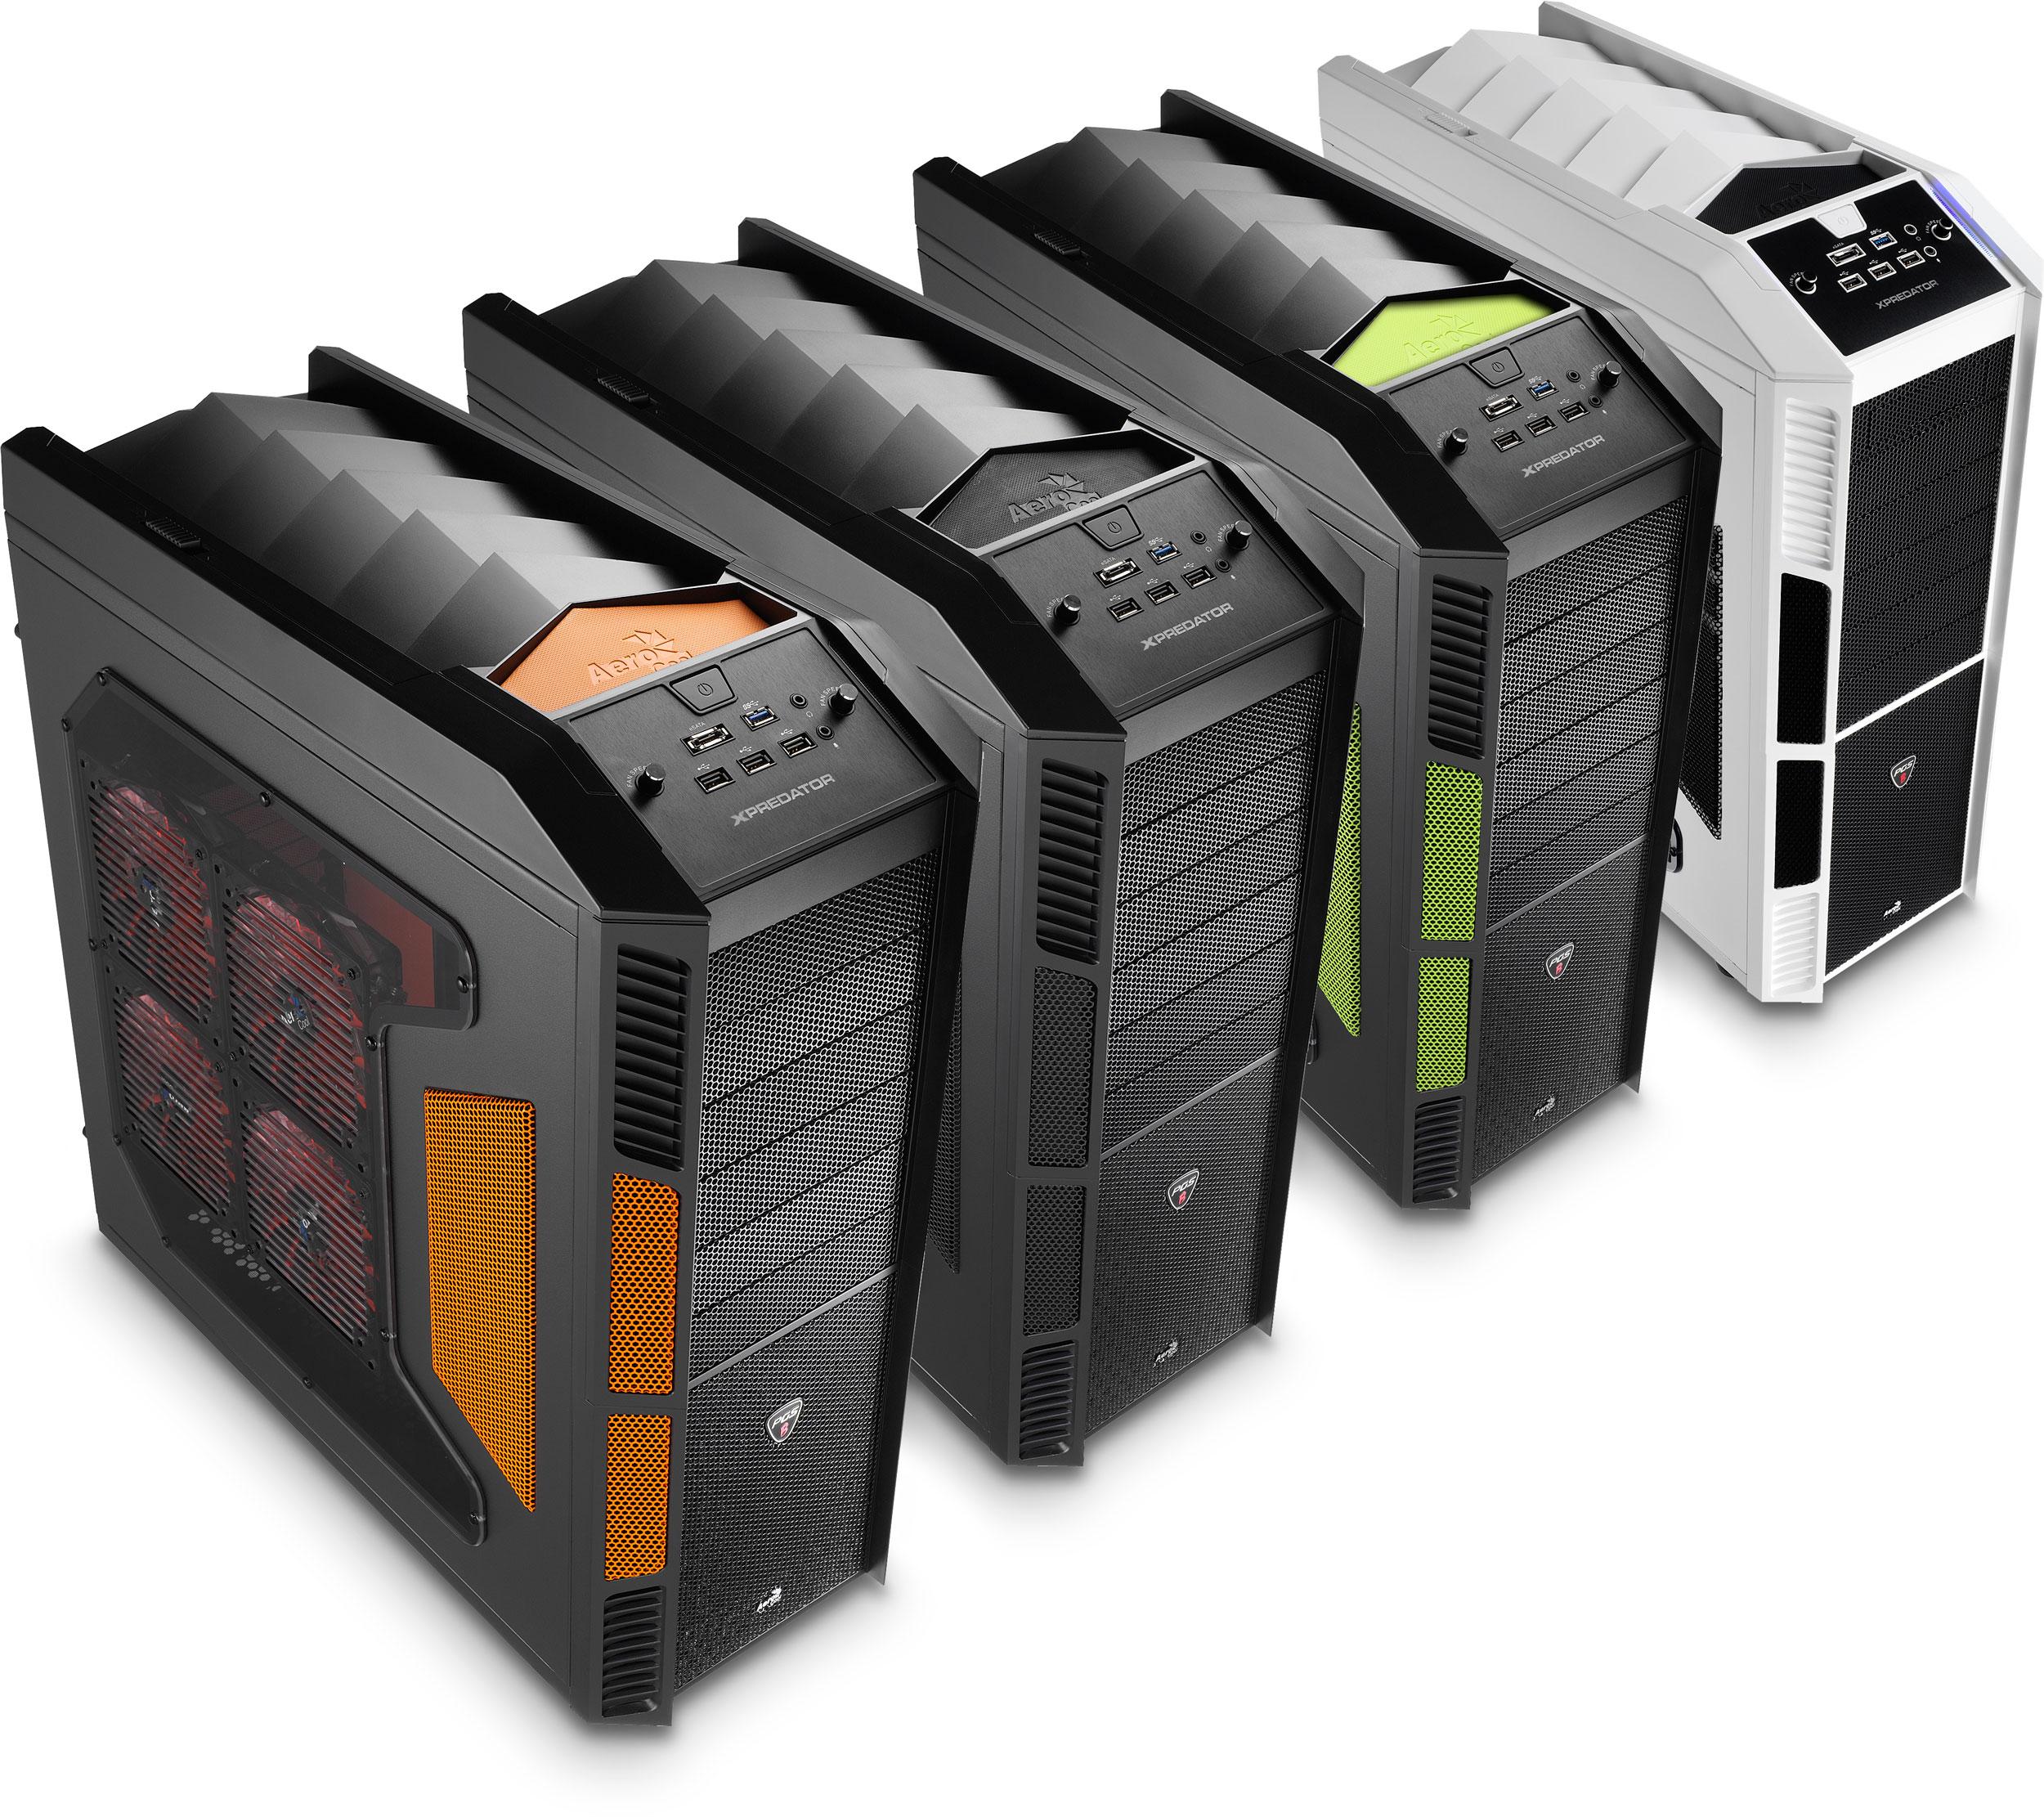 AeroCool's X-Predator Ultimate Gaming Cases